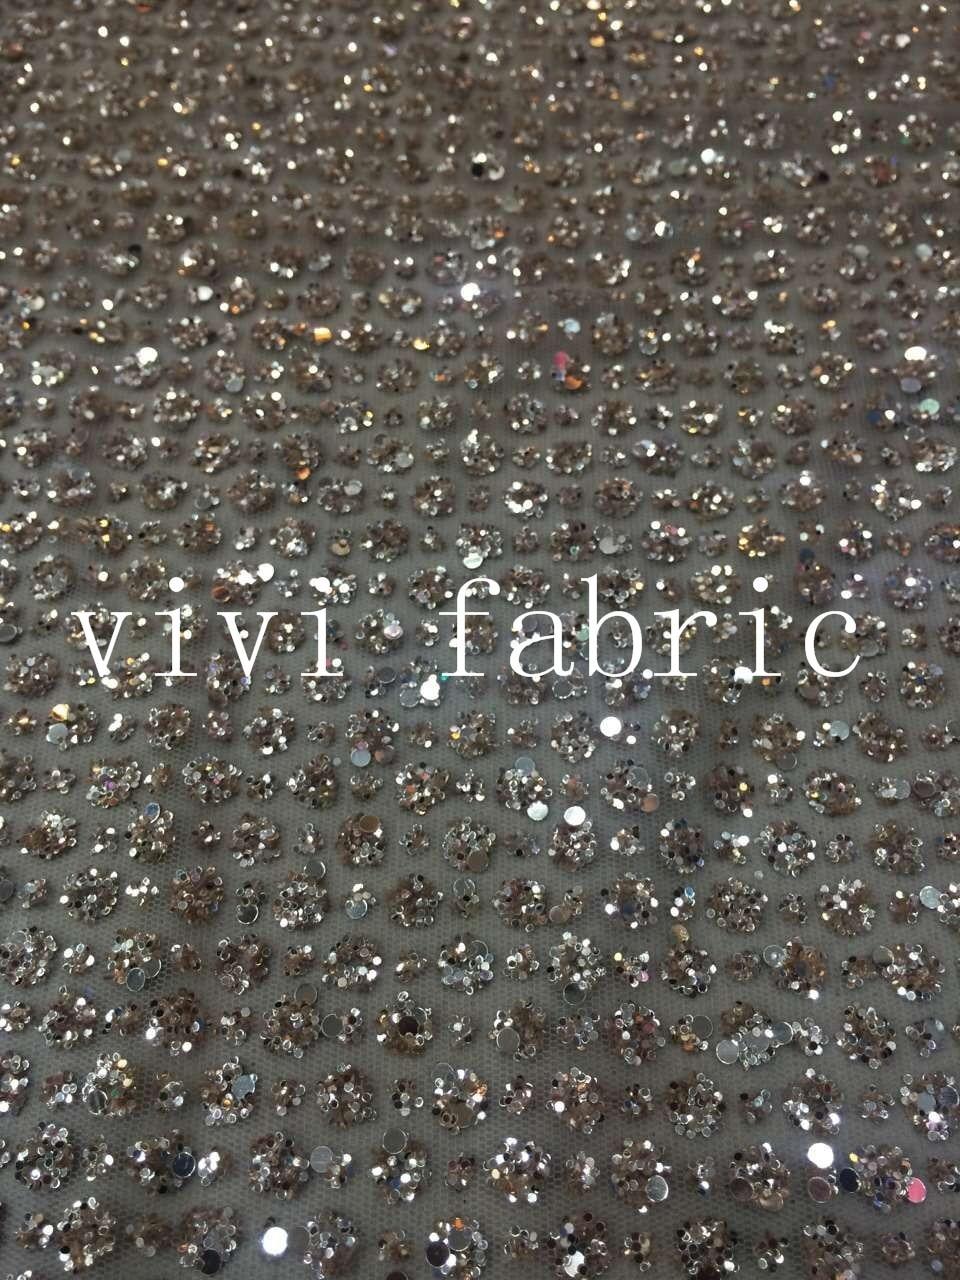 impressão glitter faísca africano índia tule de